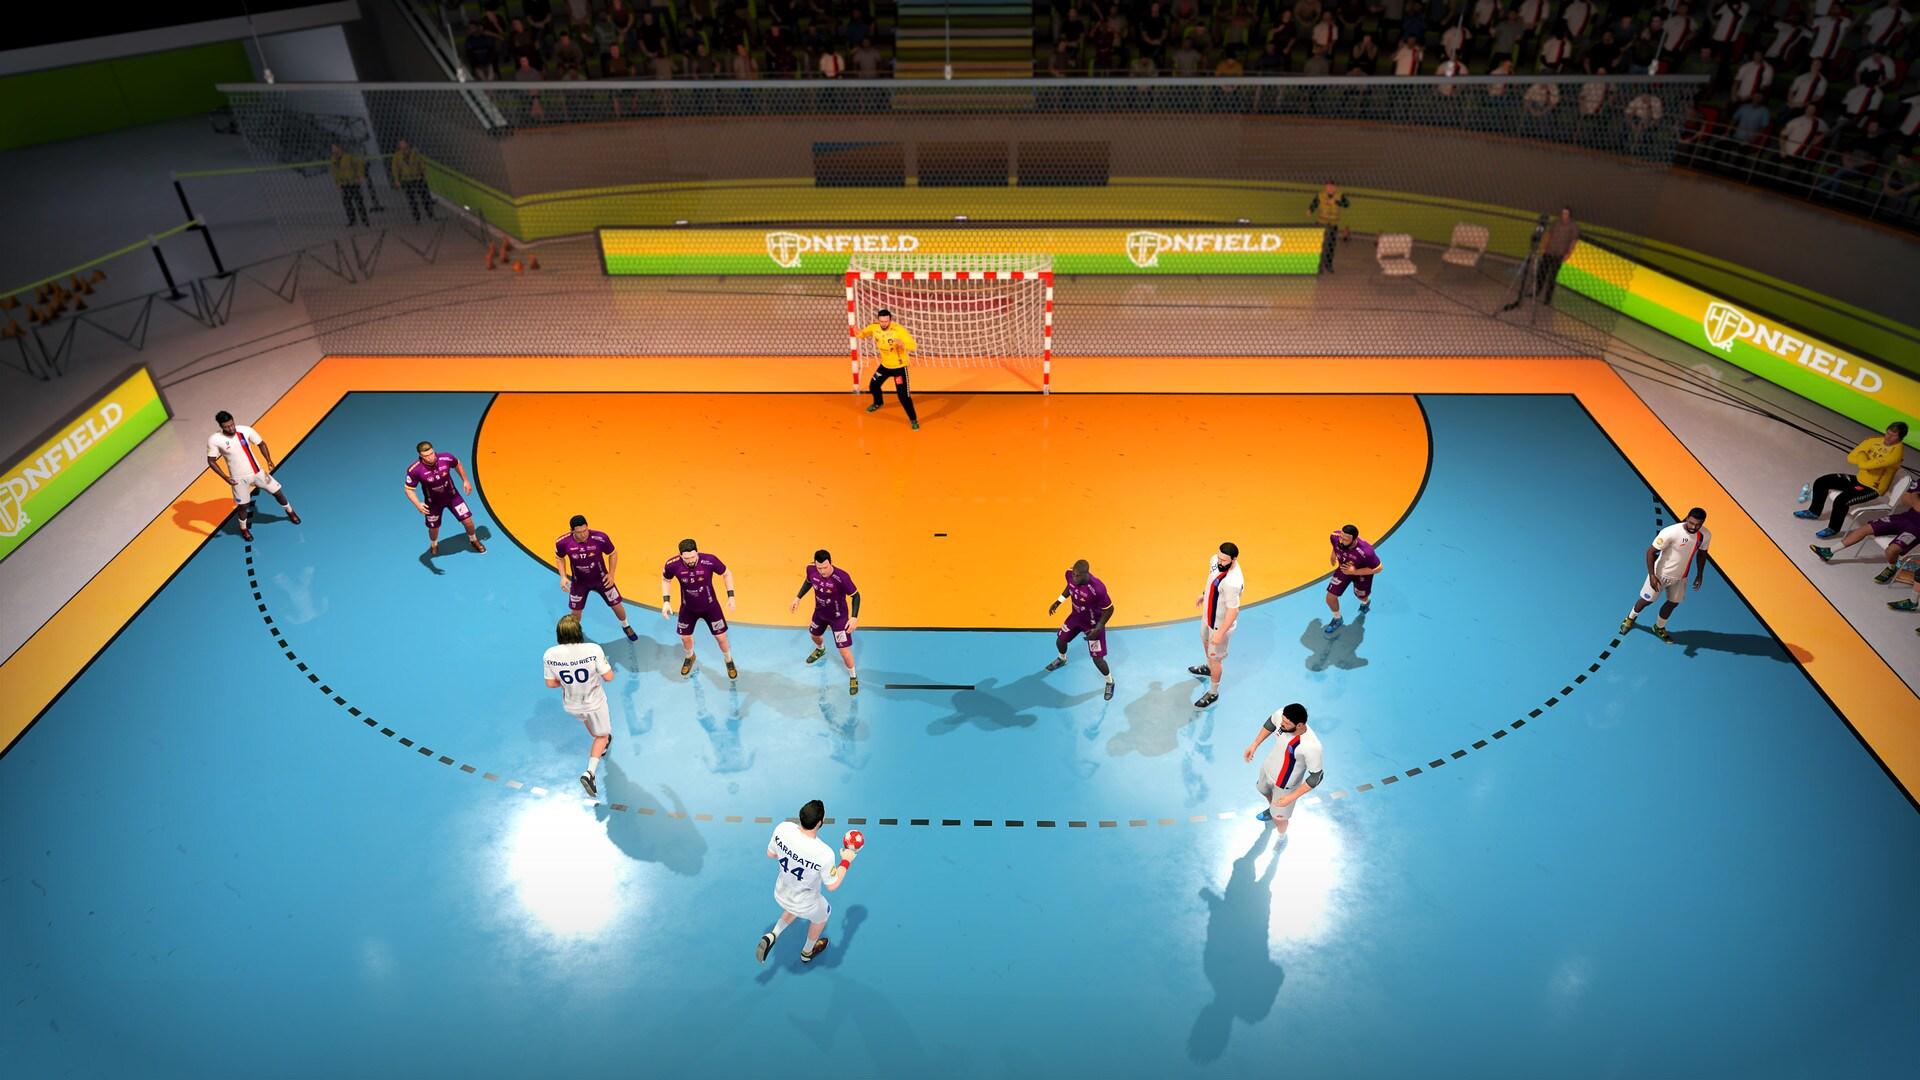 Handball 21 (PC) - Steam Gift - JAPAN - 3